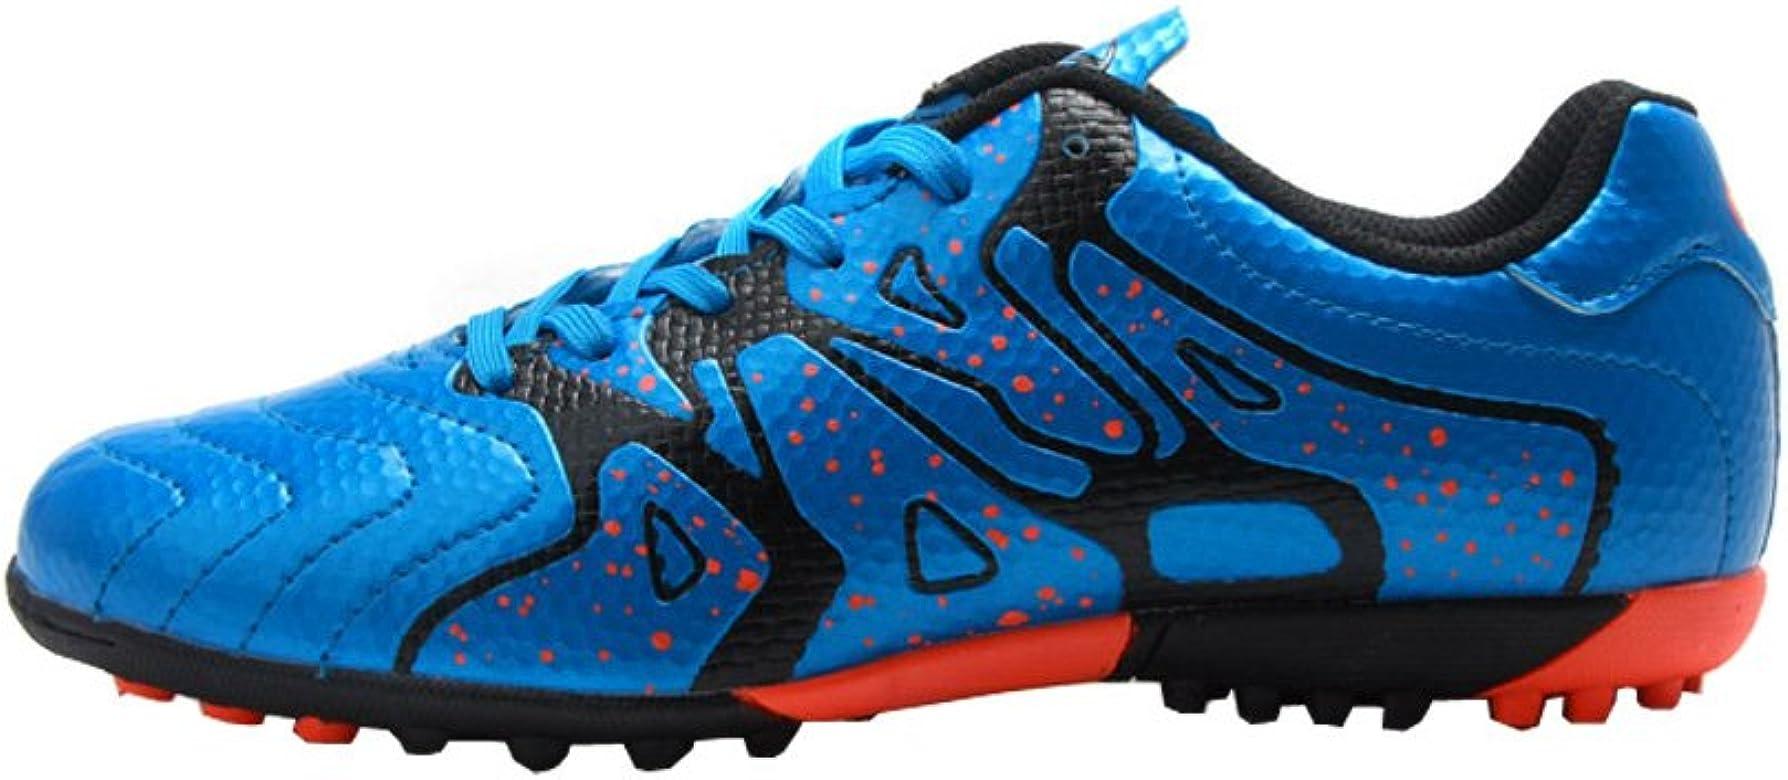 Kids' Indoor Soccer Football Shoes